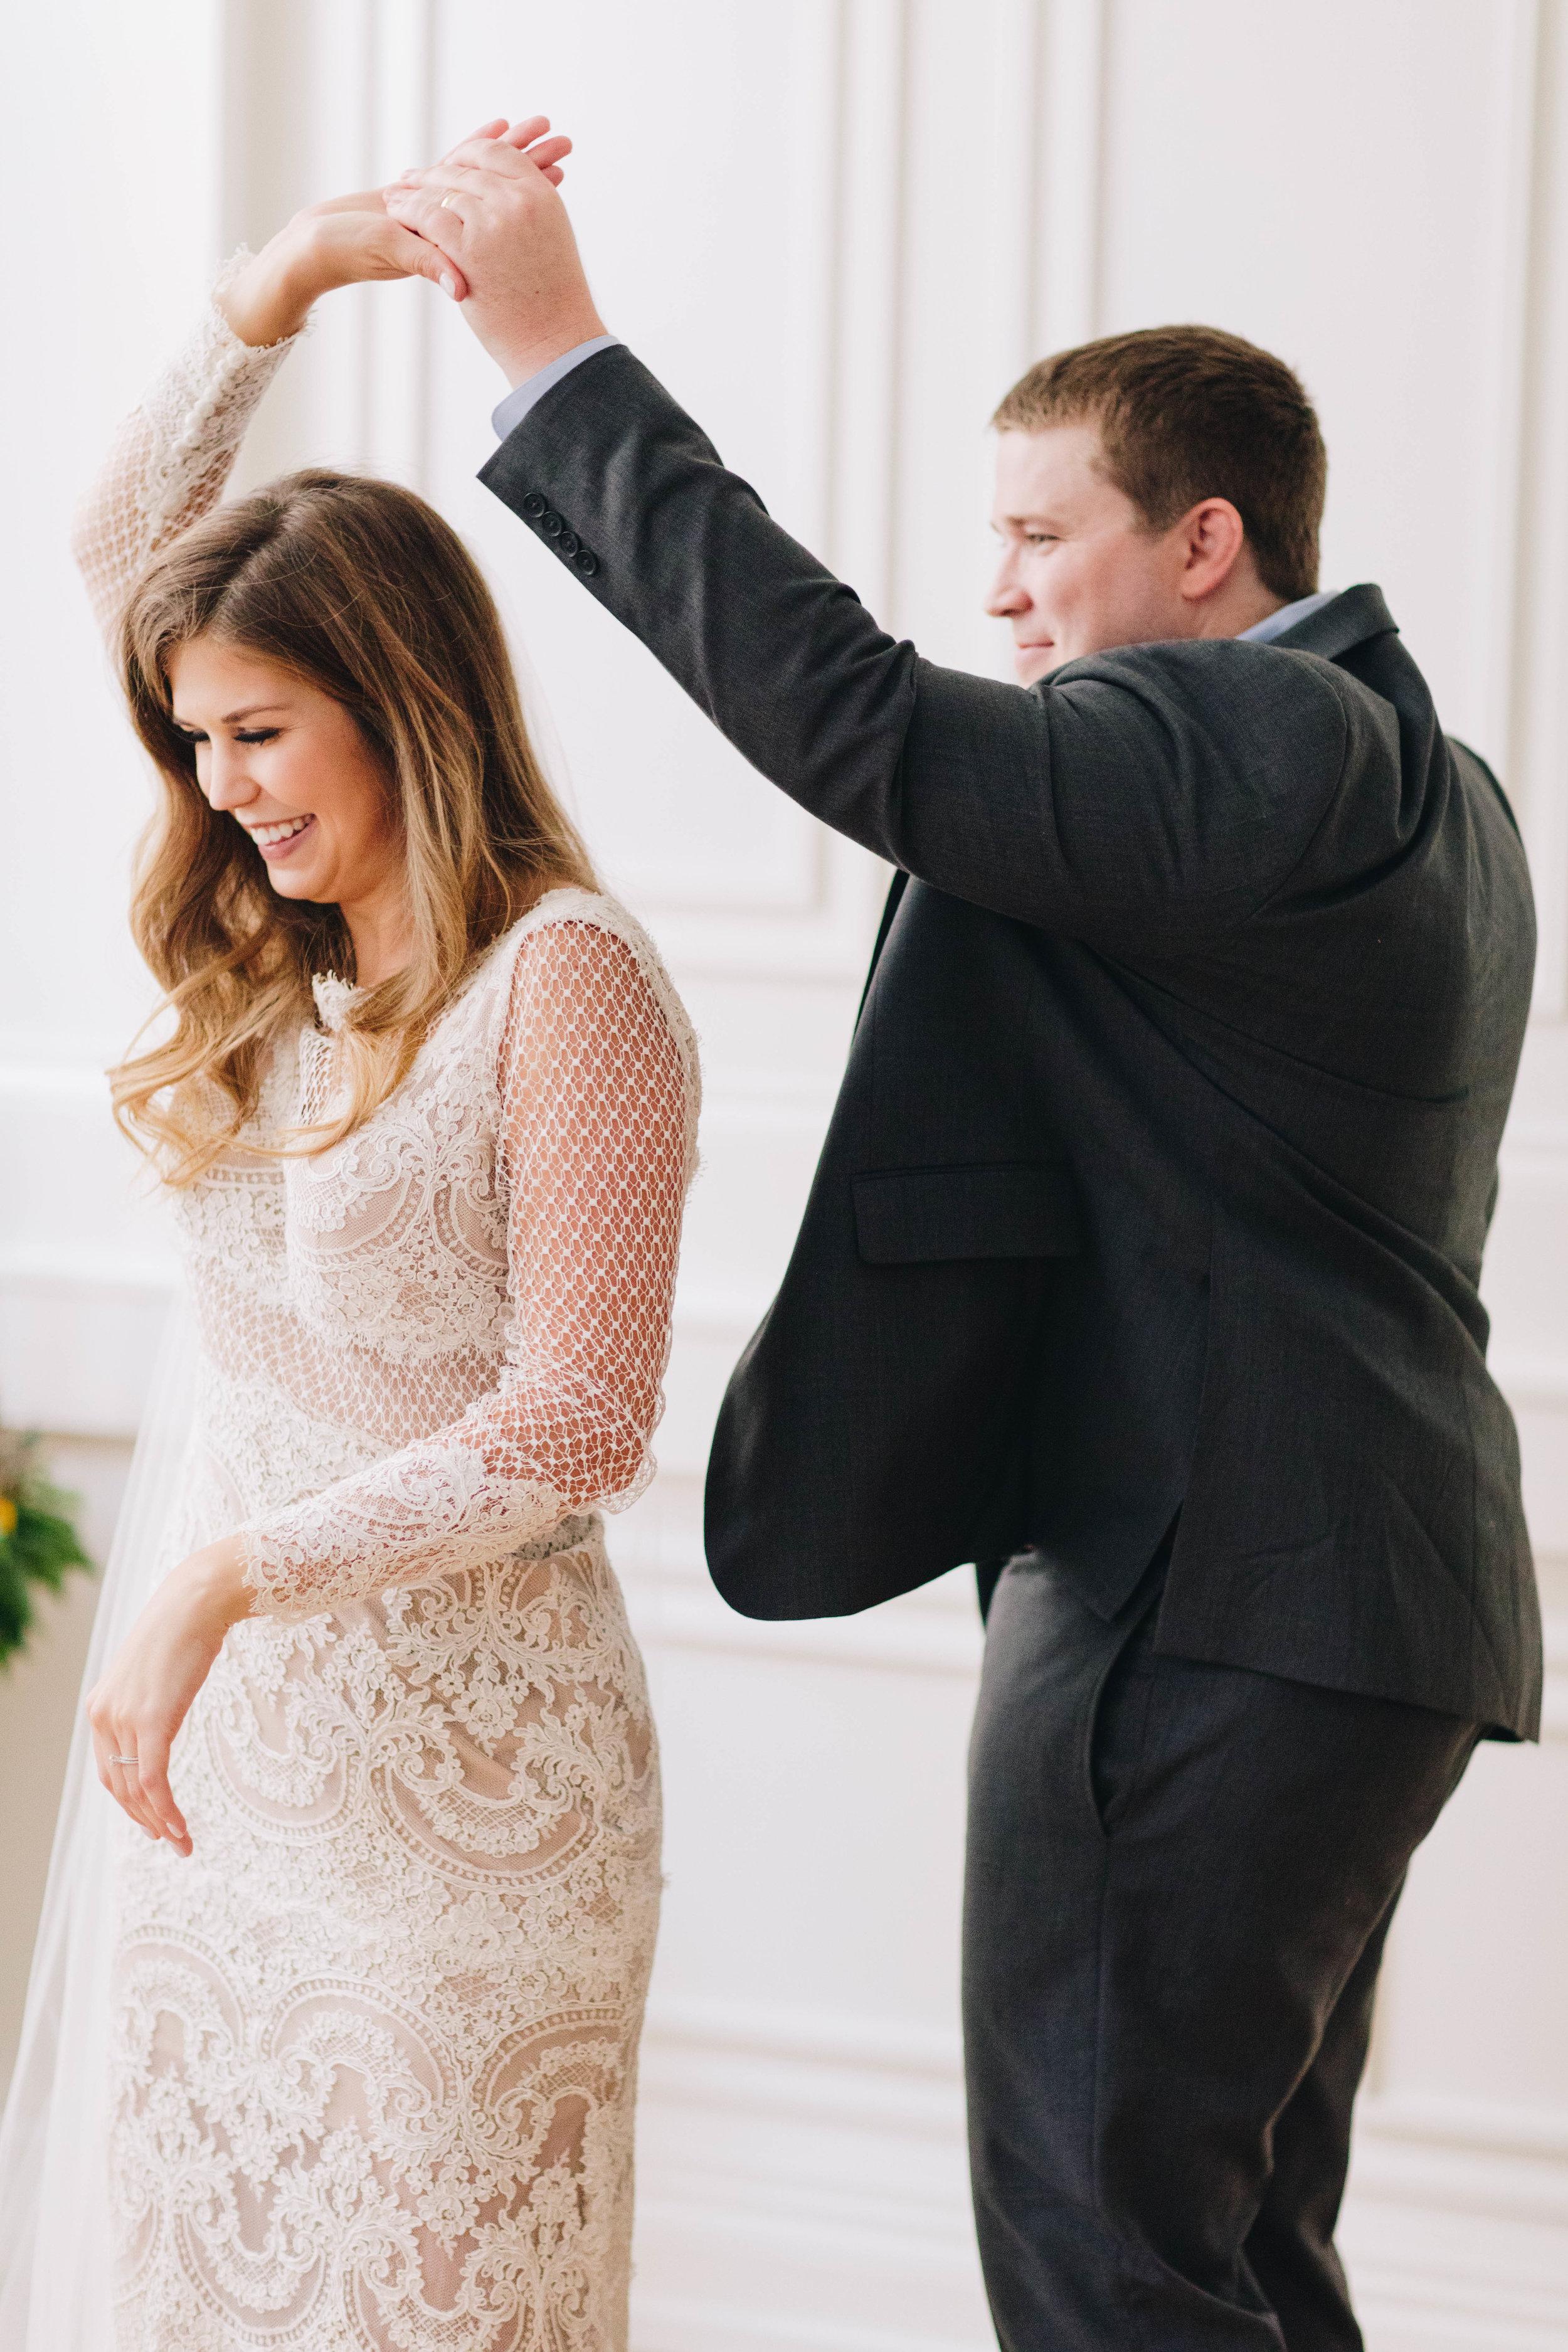 weddinghighlights-5.jpg